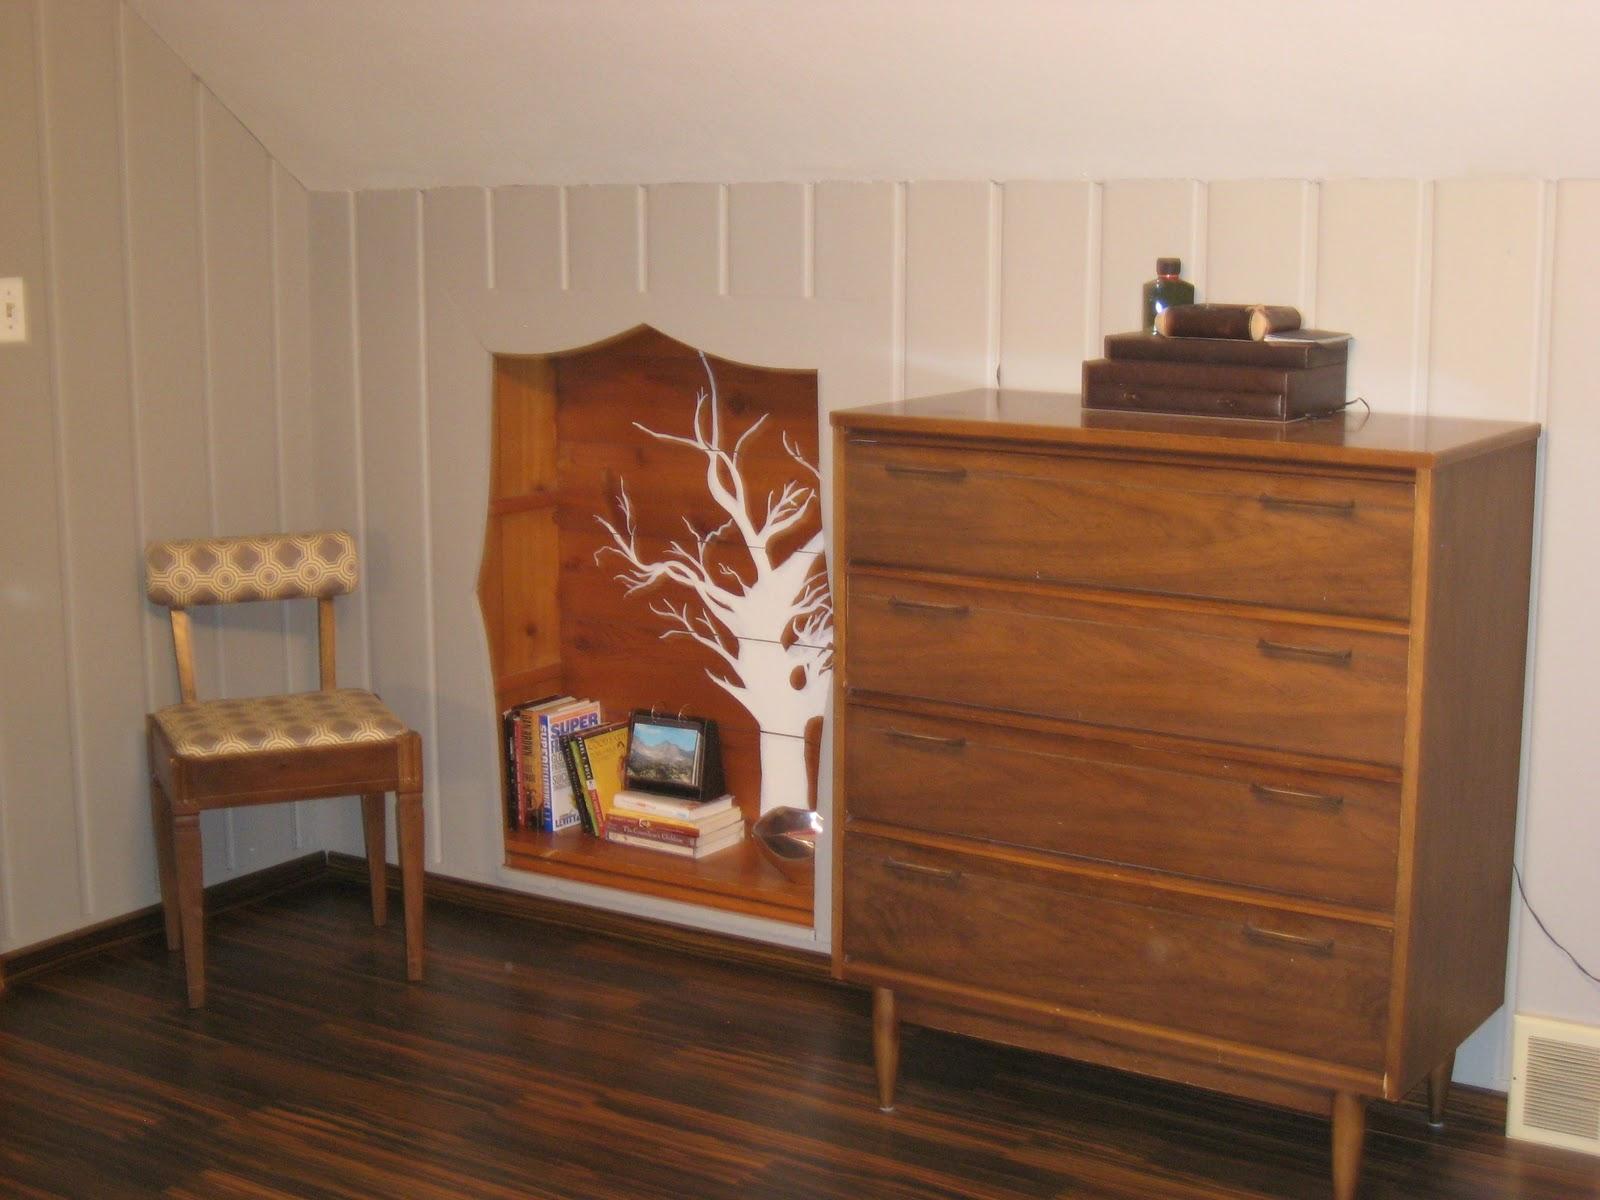 Painted Knotty Pine Kitchen Cabinrts Kitchen Cabinet